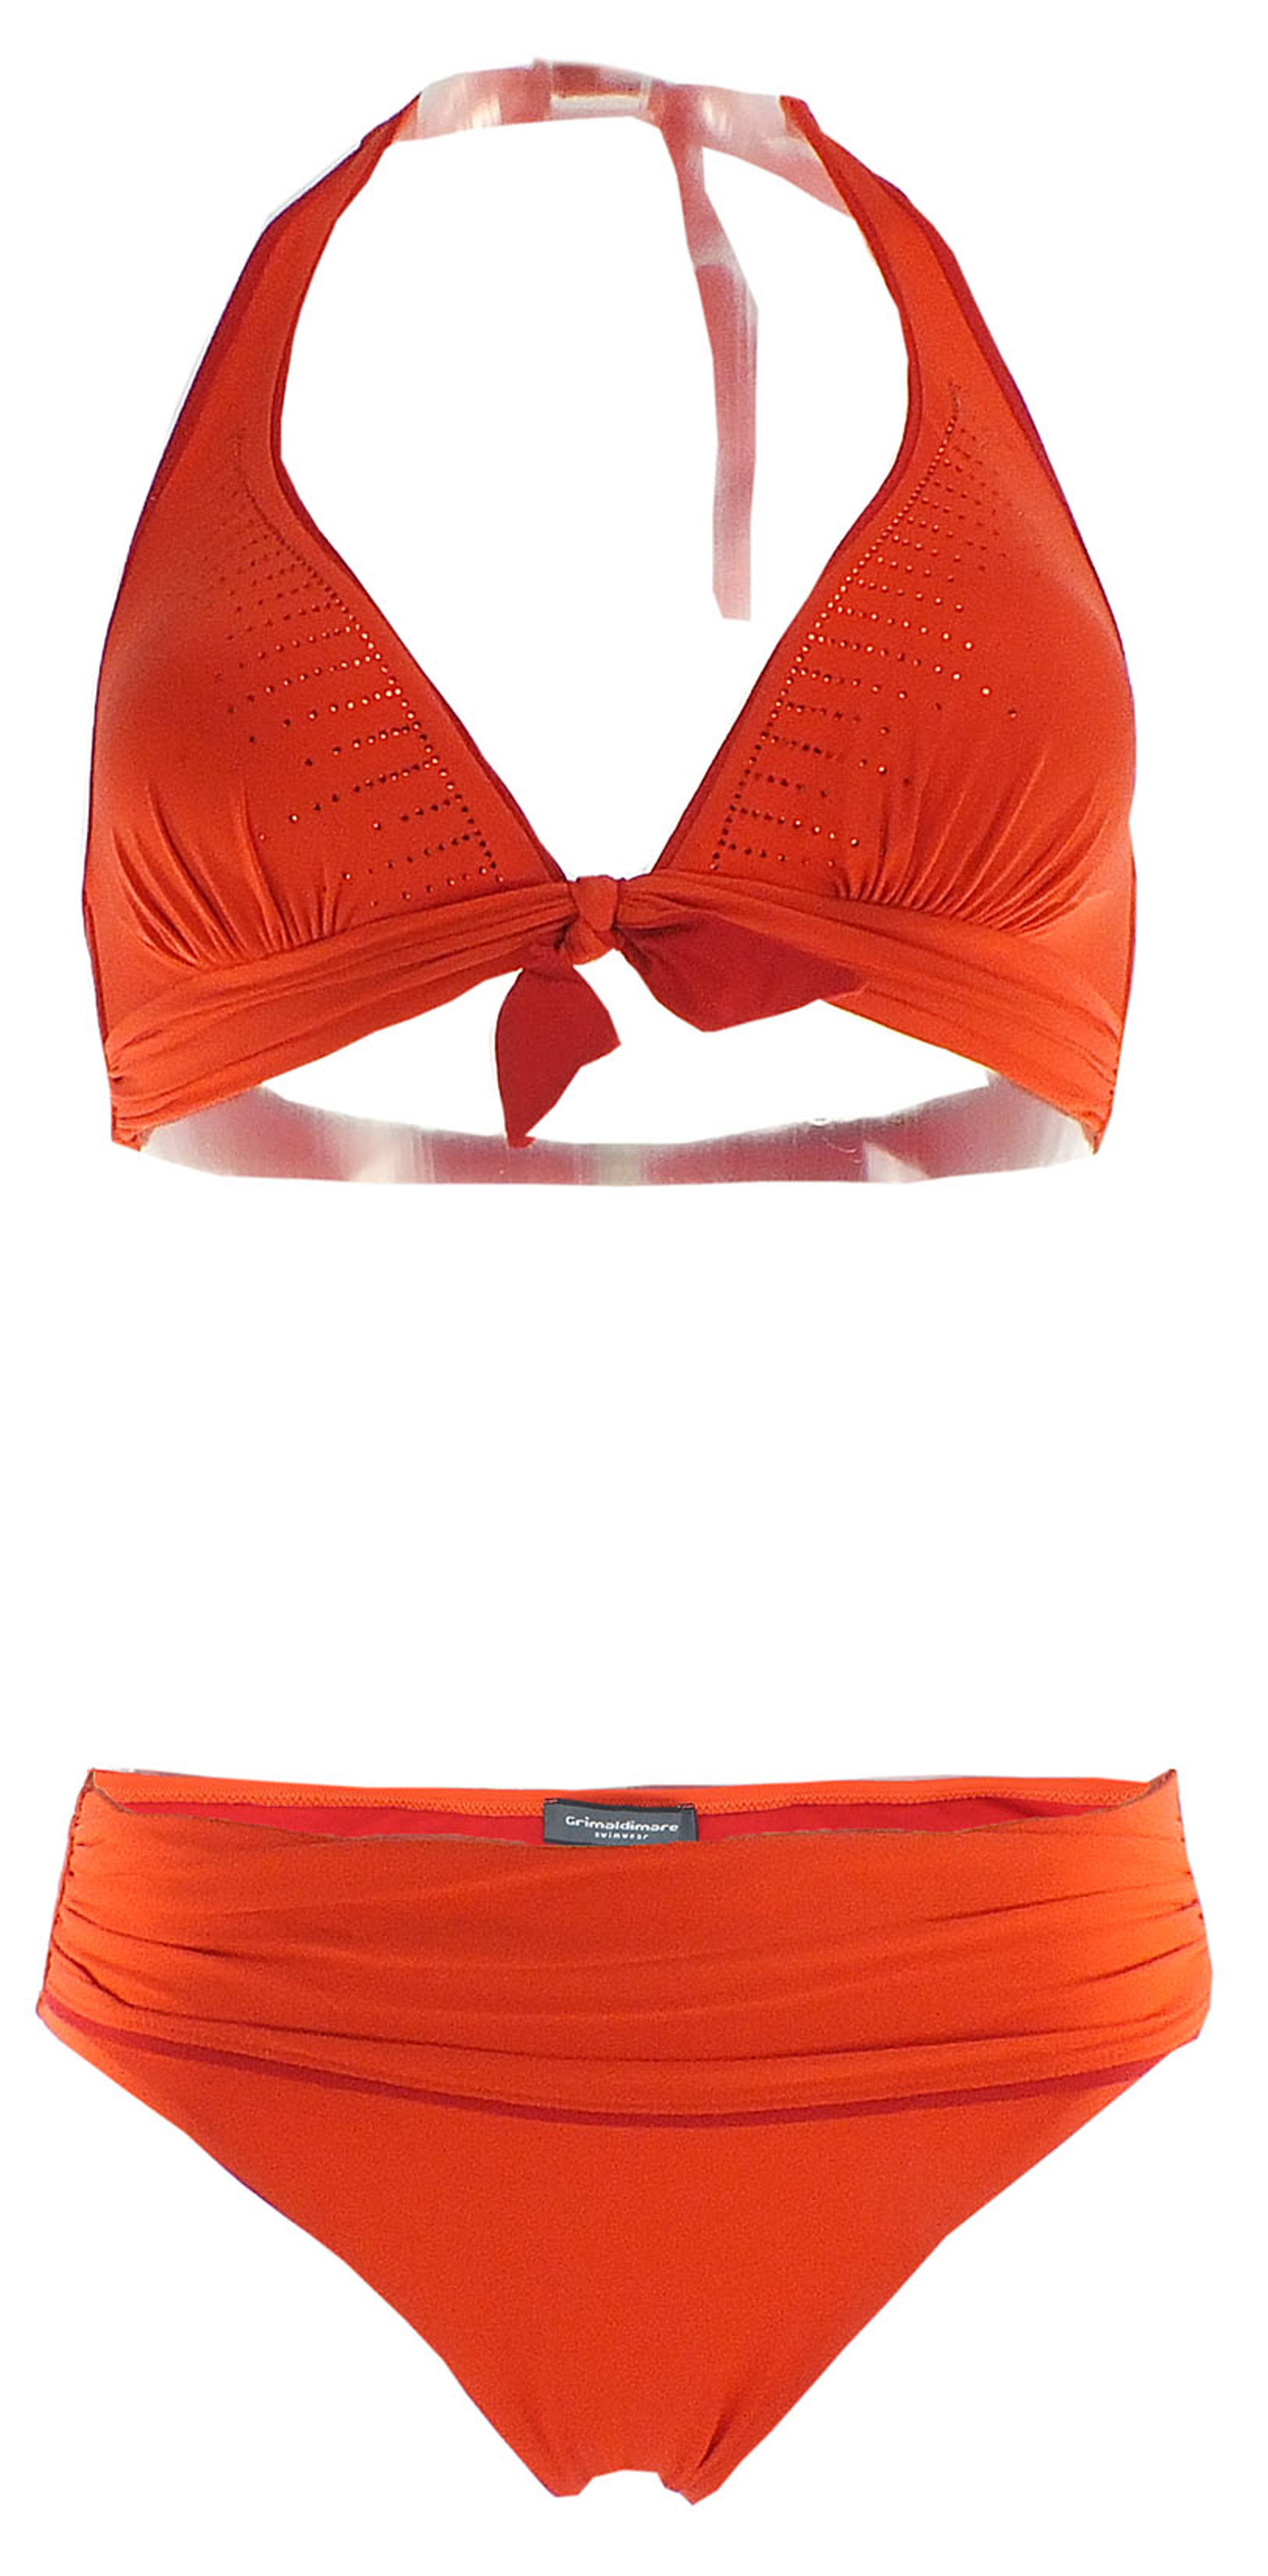 Neckholder-Bikini von Grimaldimare 36 lila-orange